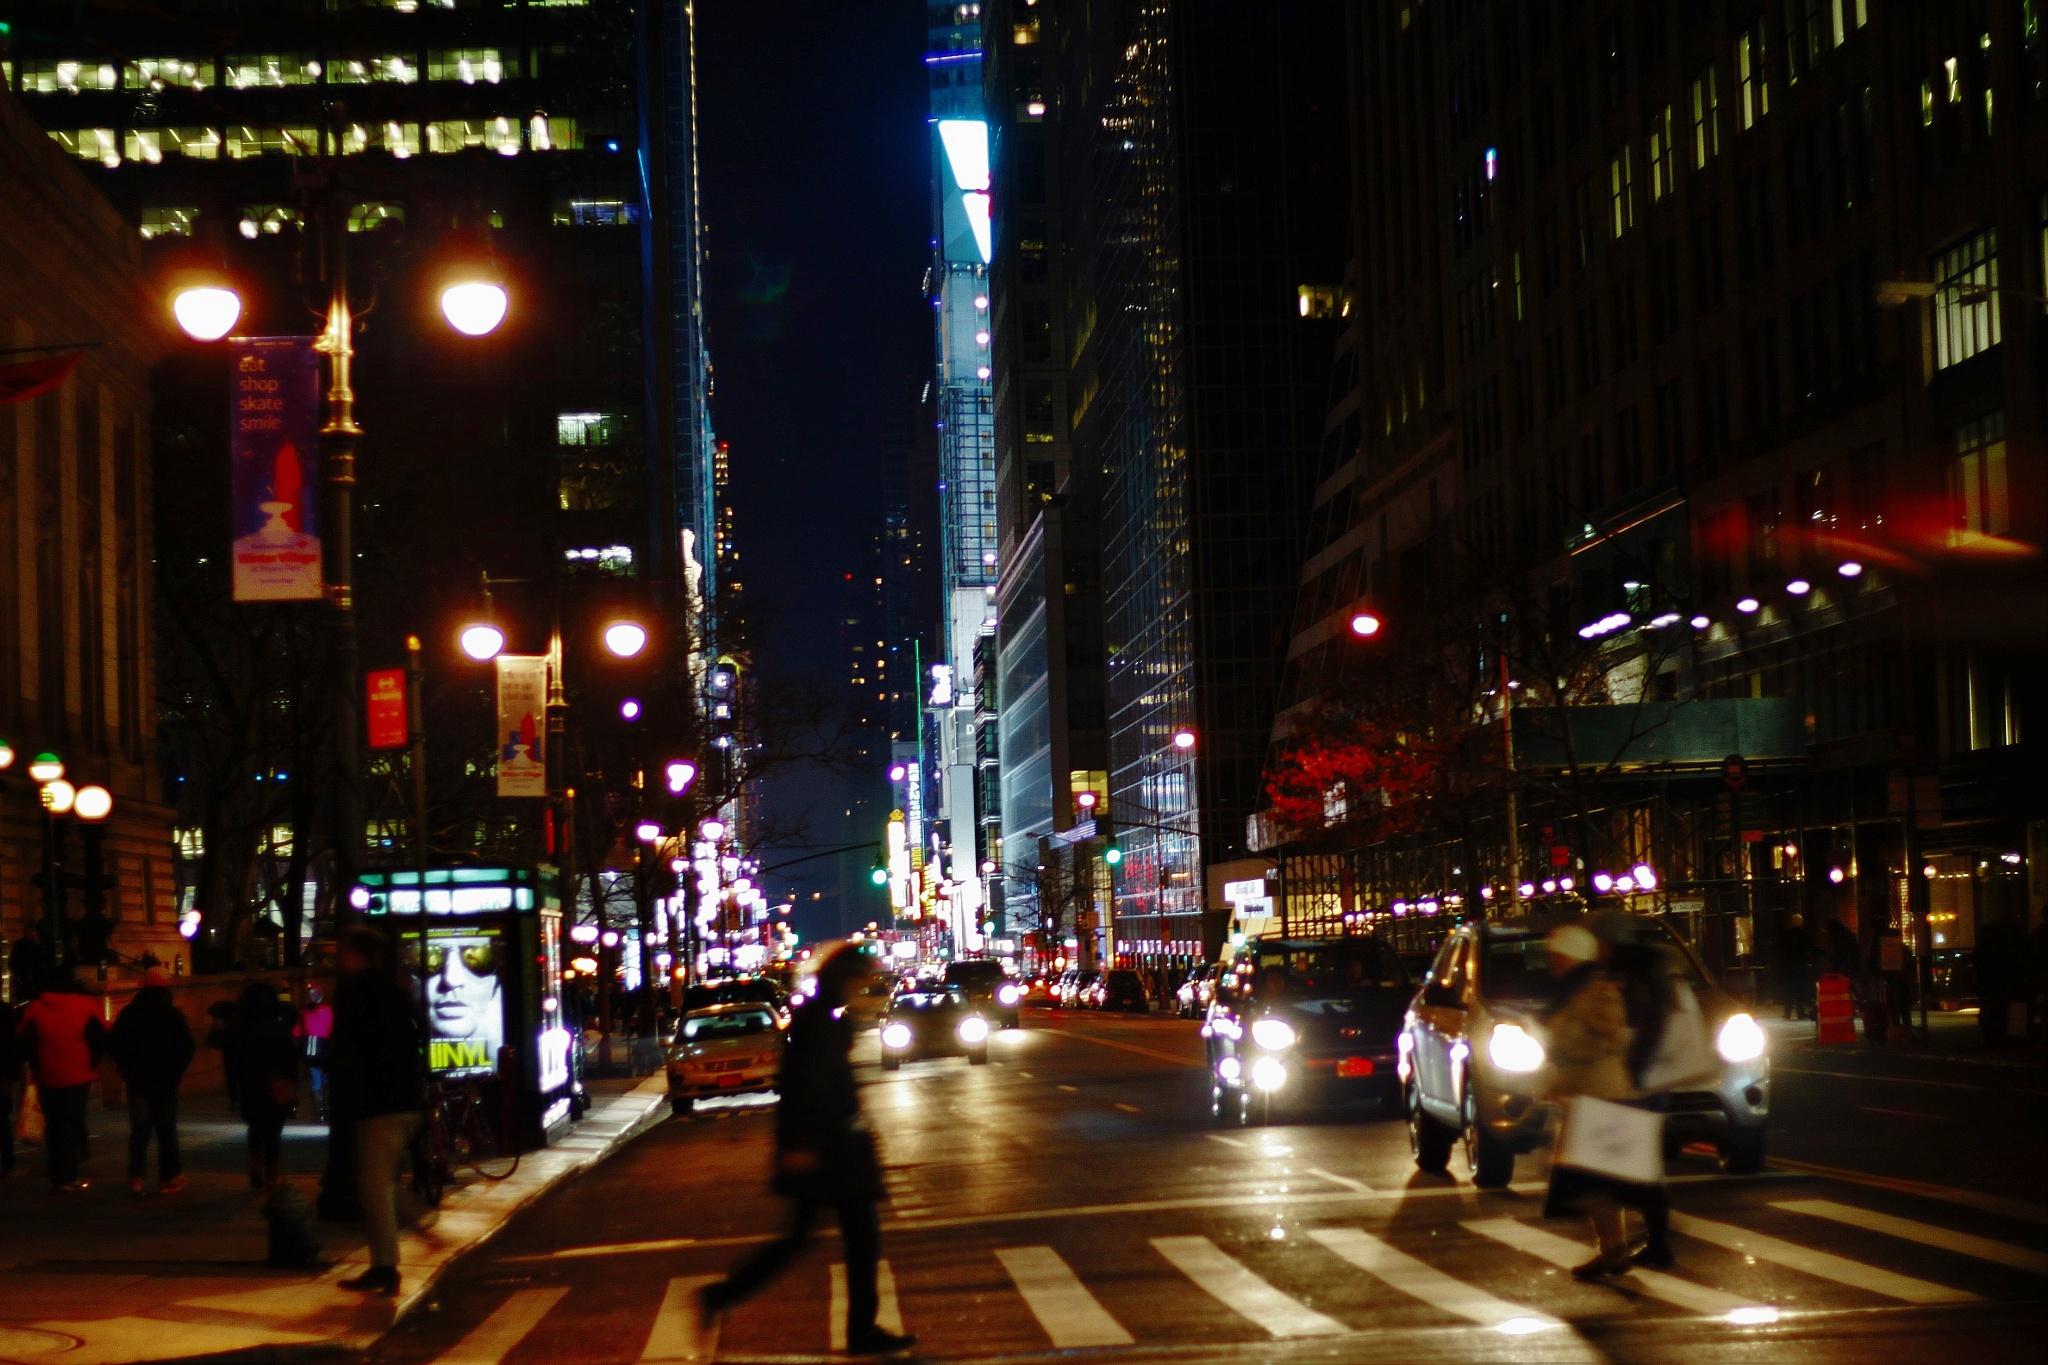 Manhattan at night, by Liborio Drogo